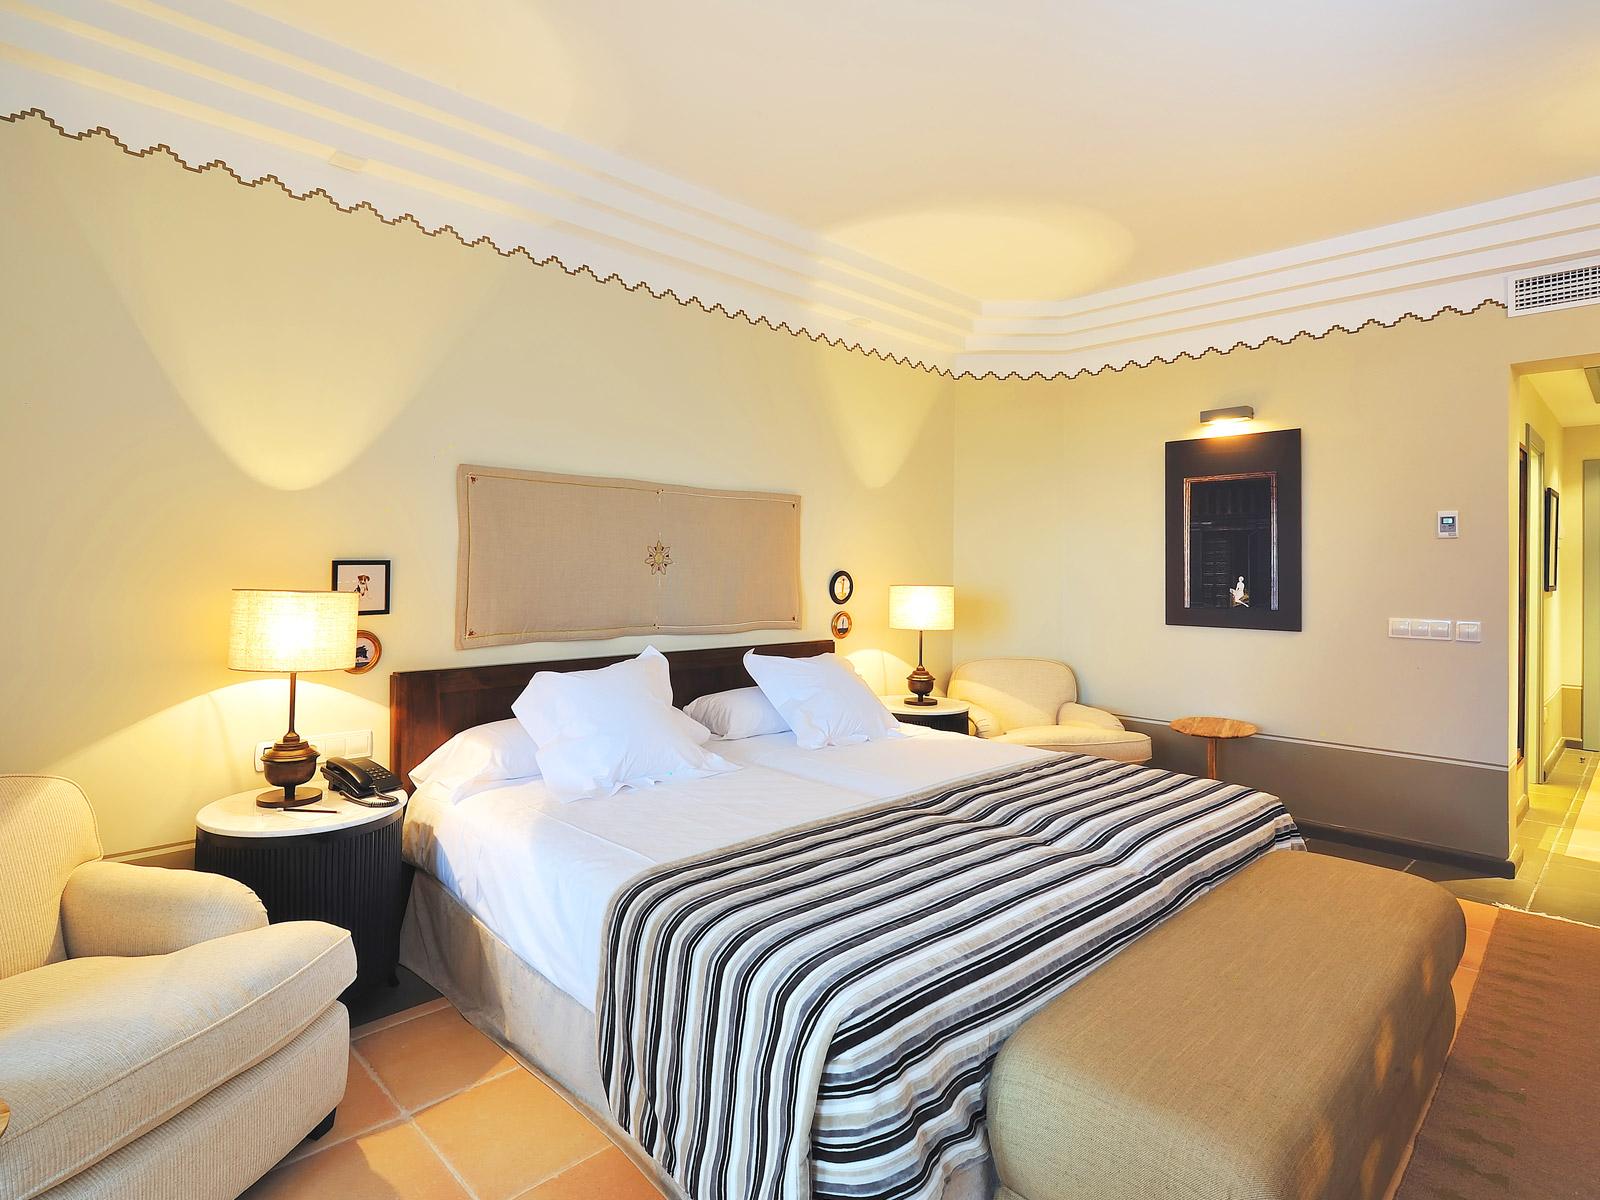 Promotions Hotel Vincci Estrella de Mar - Book now and save 15%